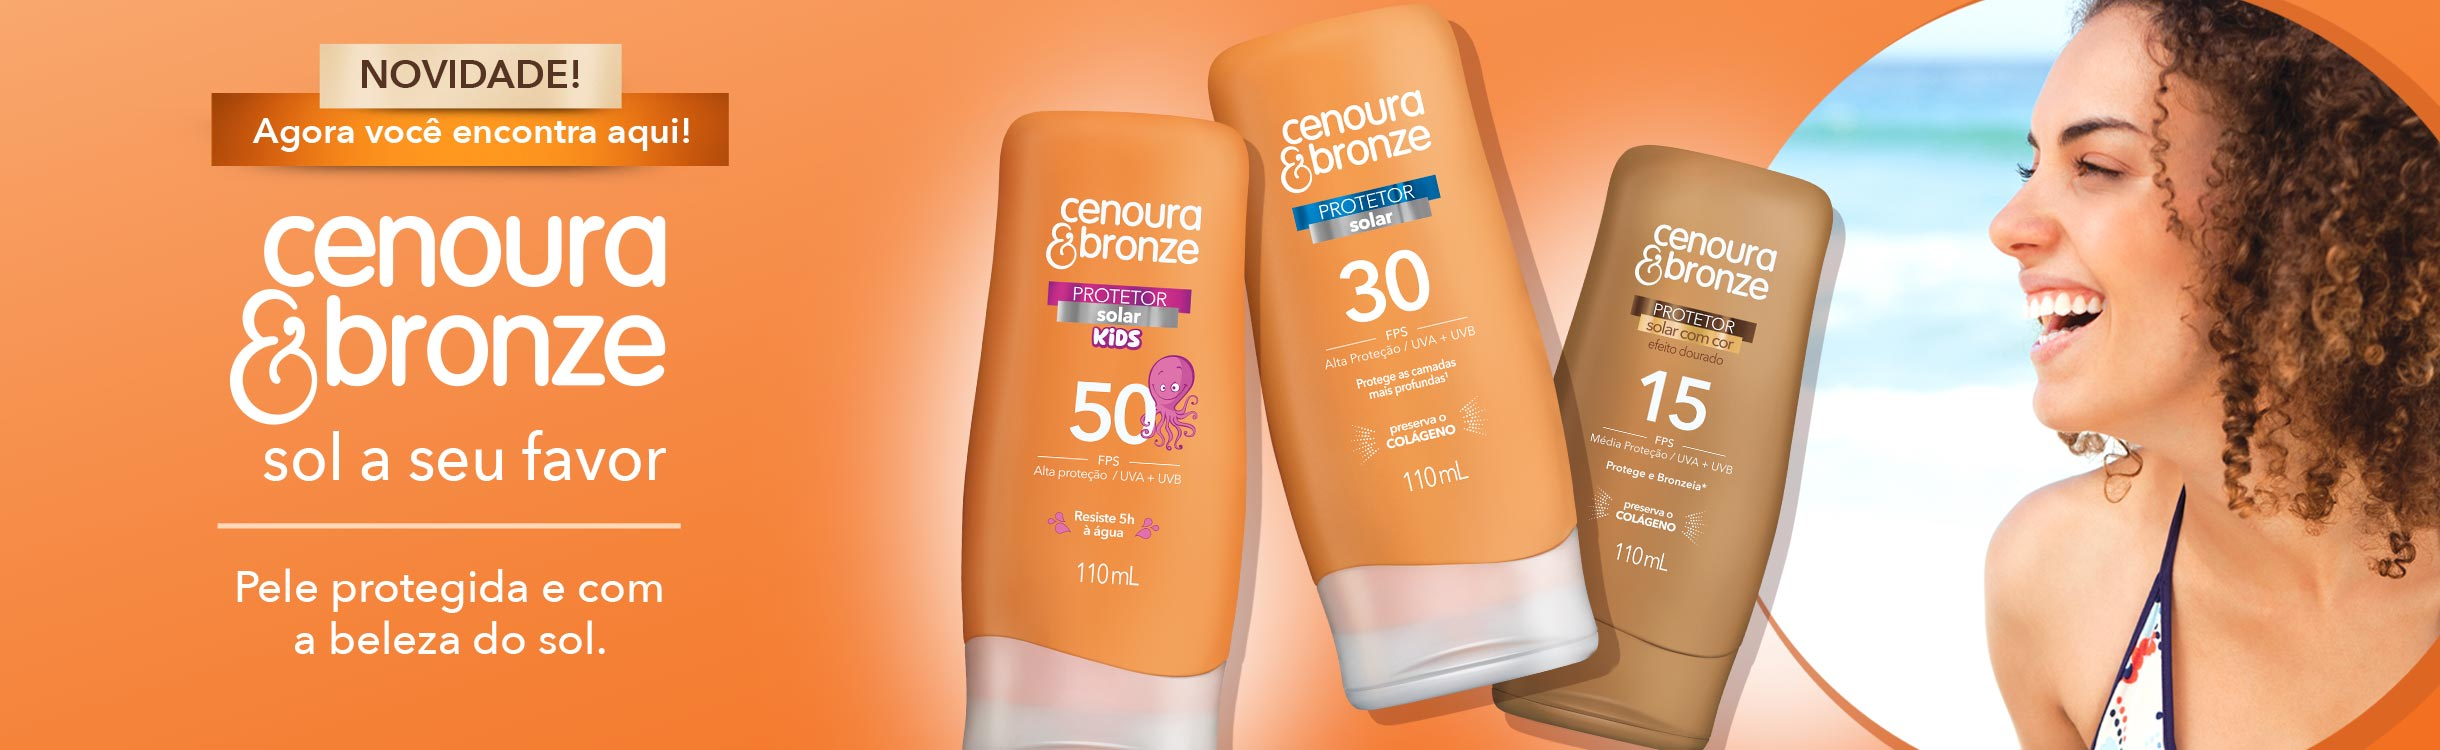 Cenoura e bronze/Corpo e banho/Protetor solar e bronzeamento